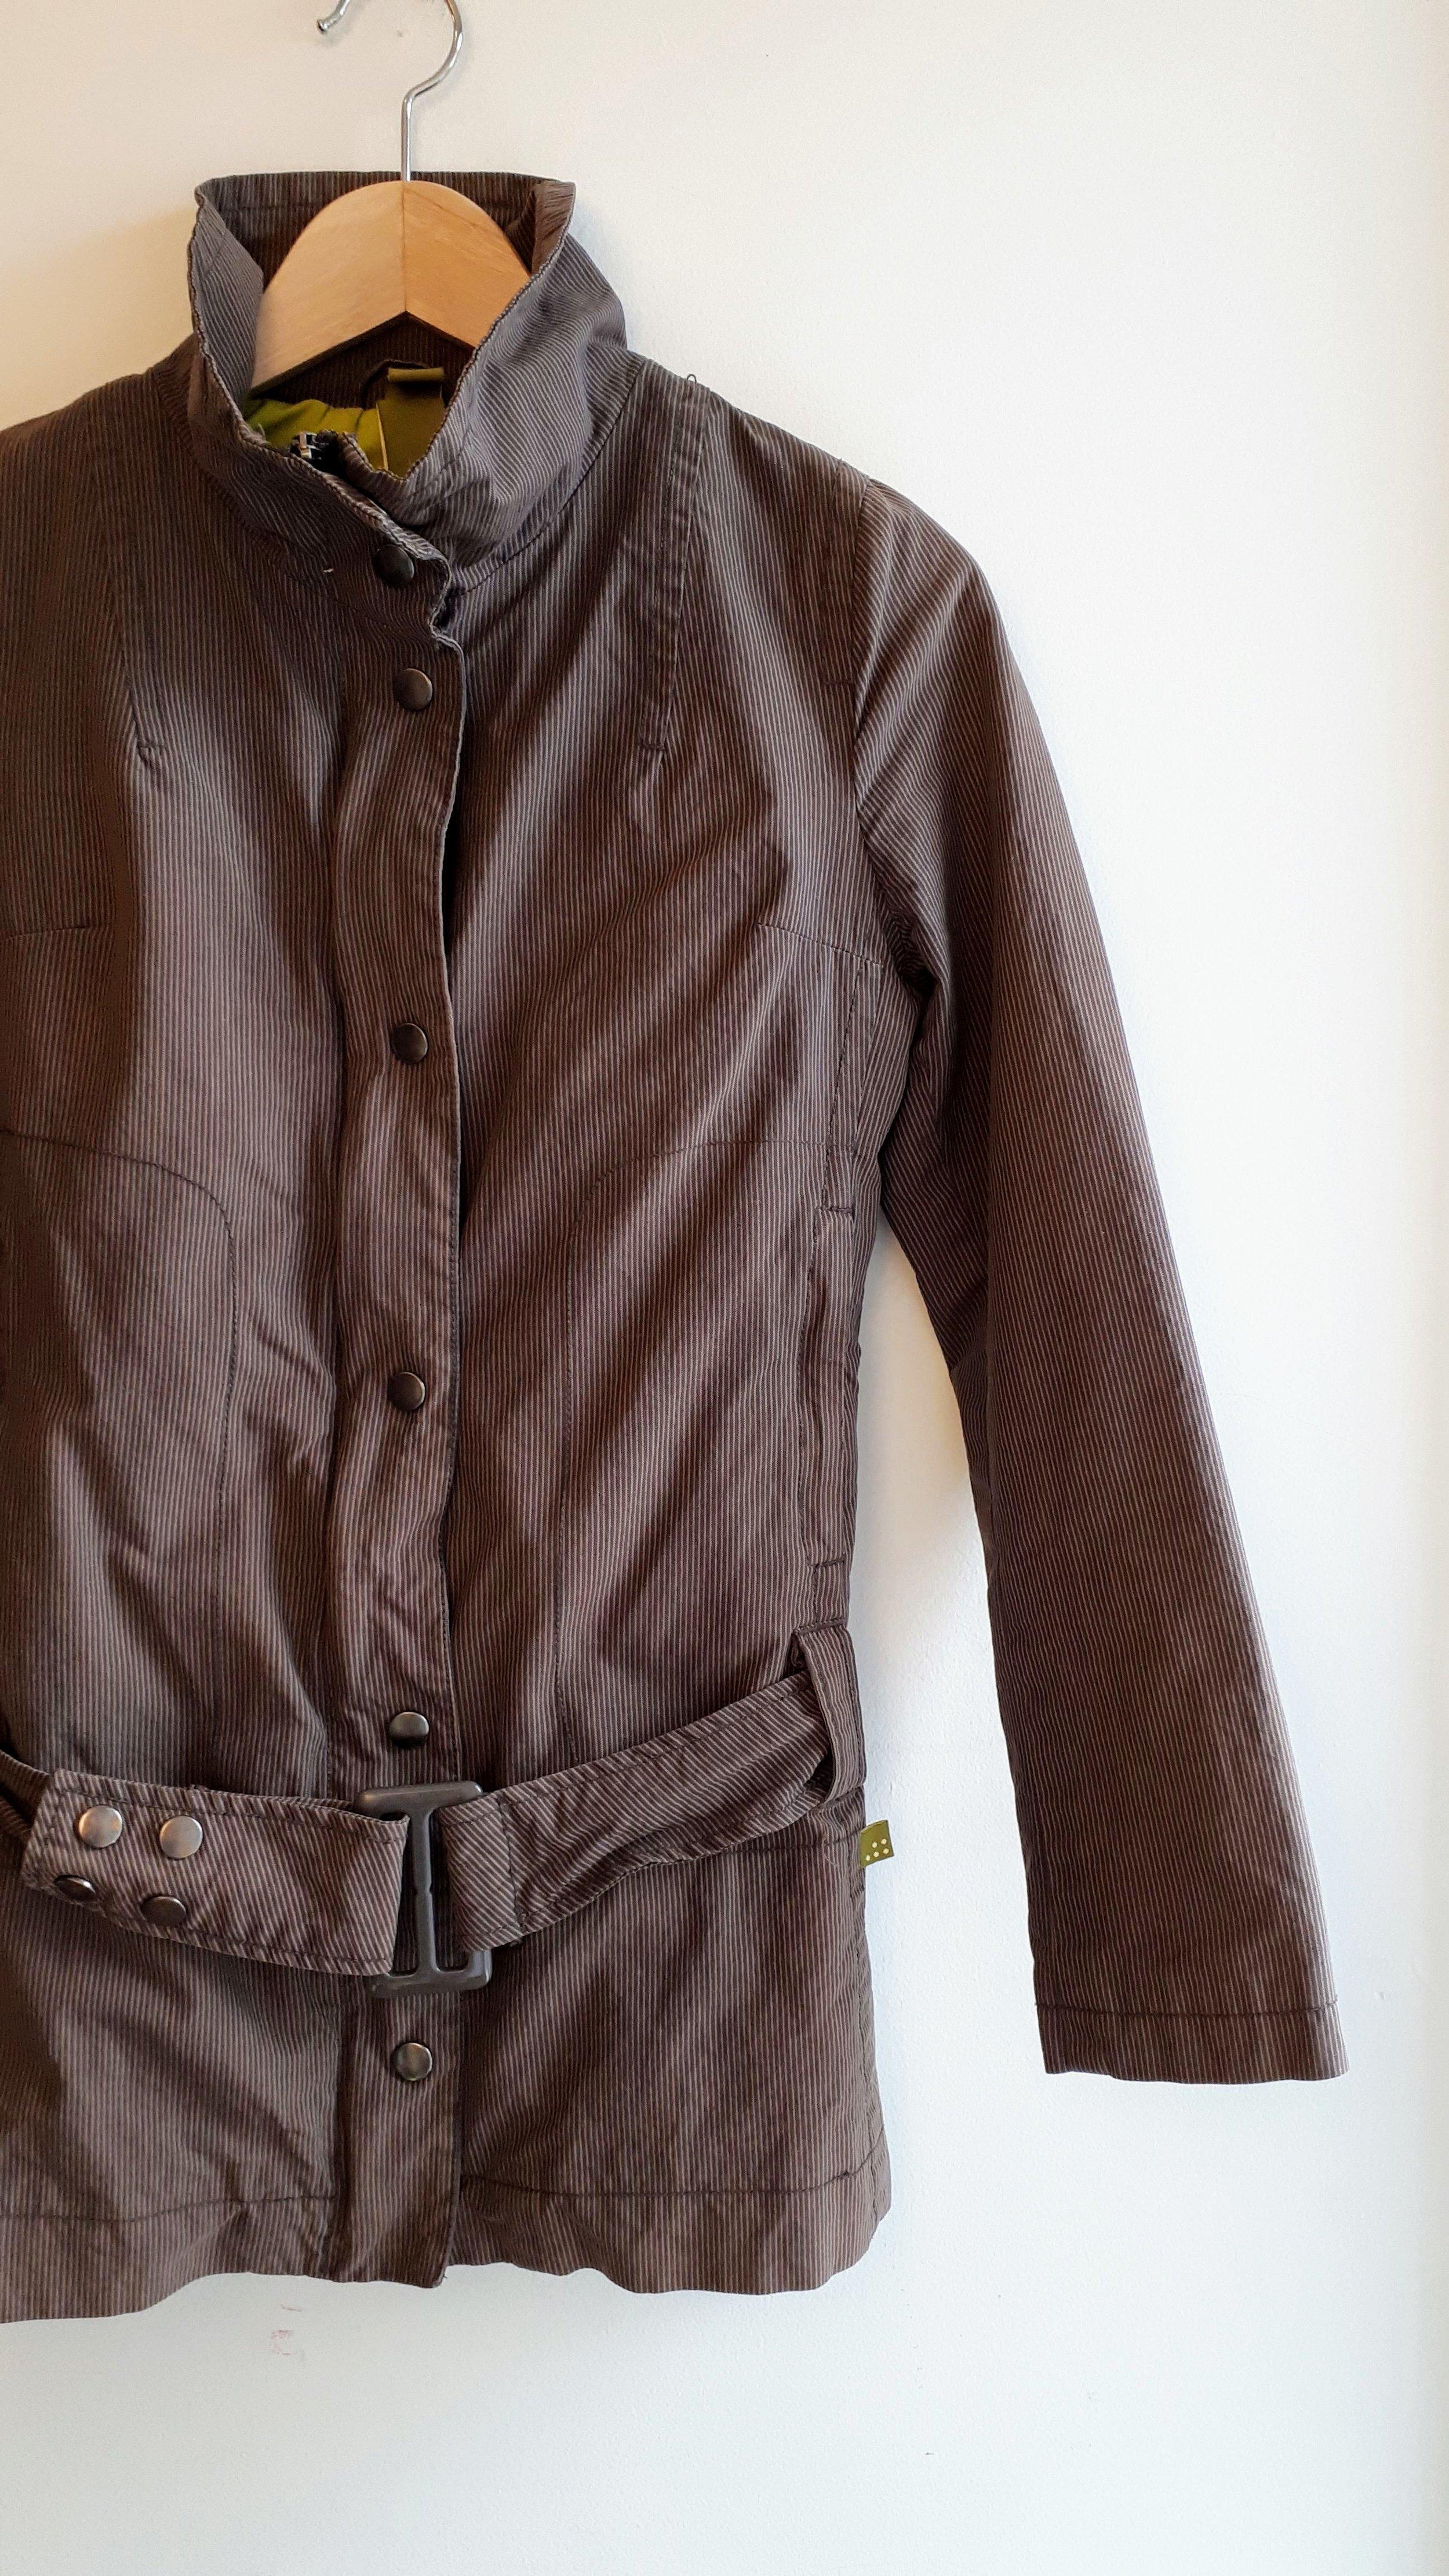 Soia & Kyo coat; Size S, $46